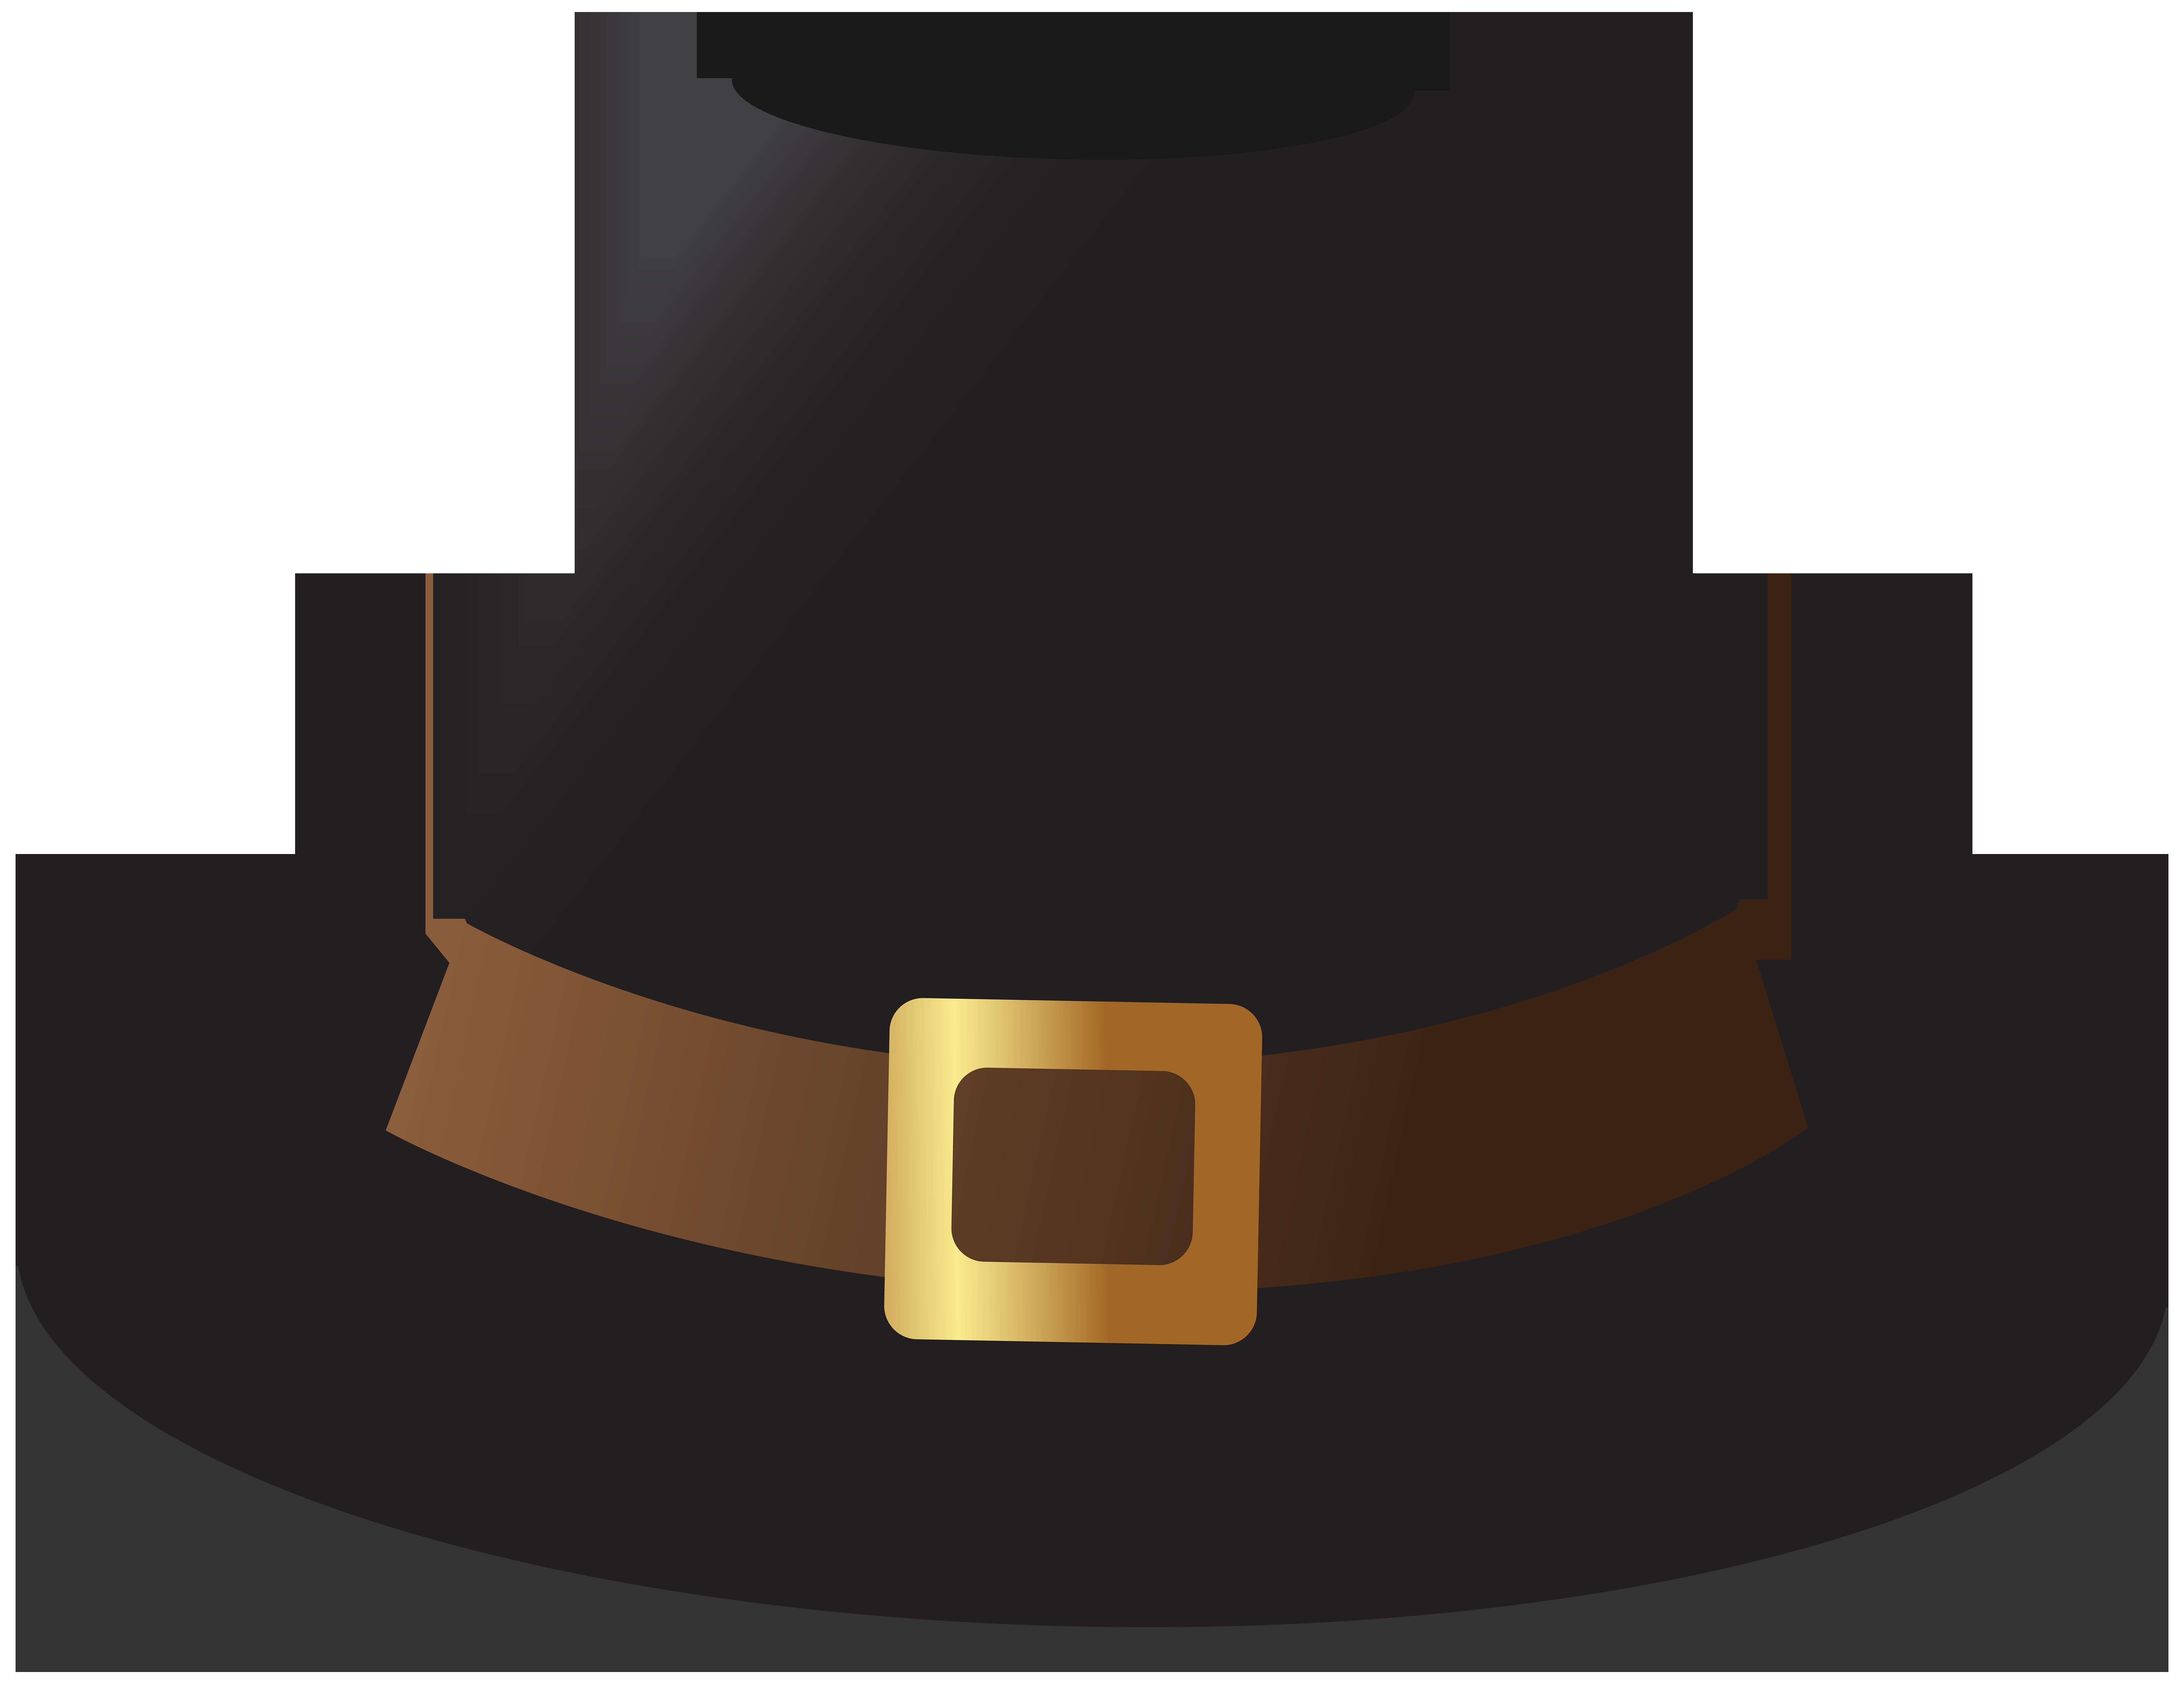 Clipart pilgrim hat image royalty free stock Black Pilgrim Hat Transparent PNG Image | Gallery Yopriceville ... image royalty free stock